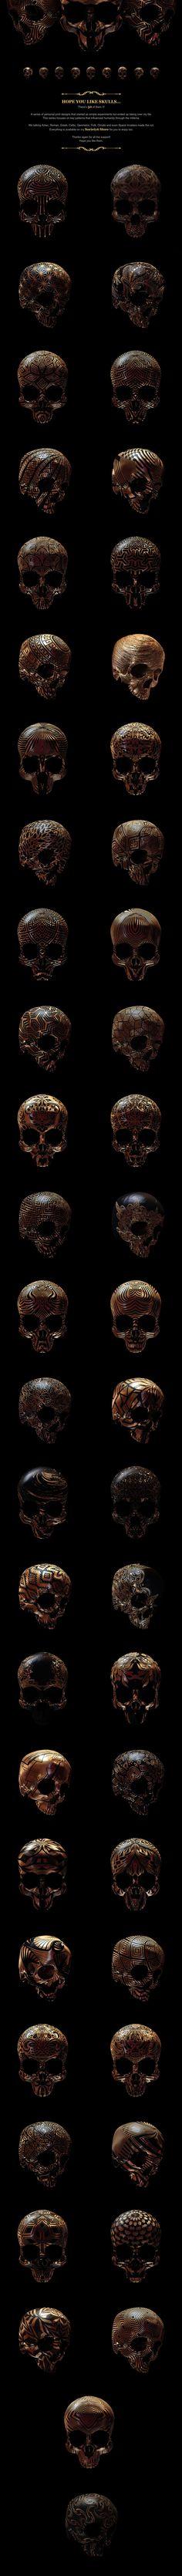 Hope you like skulls by Billy Bogiatzoglou